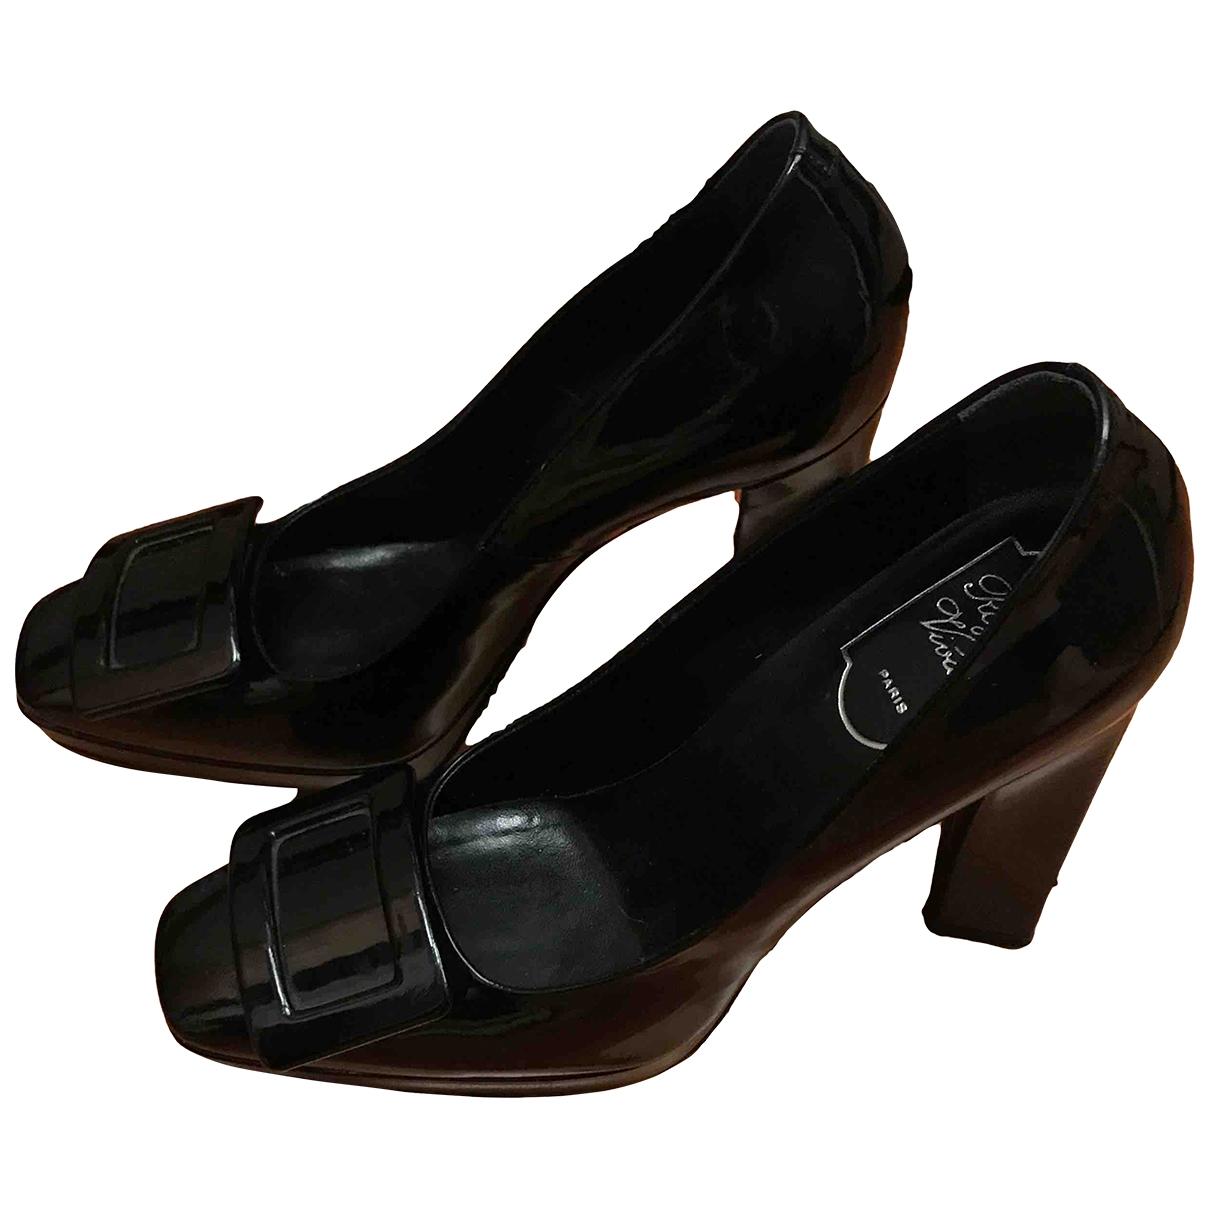 Roger Vivier Belle Vivier Black Patent leather Heels for Women 39 EU